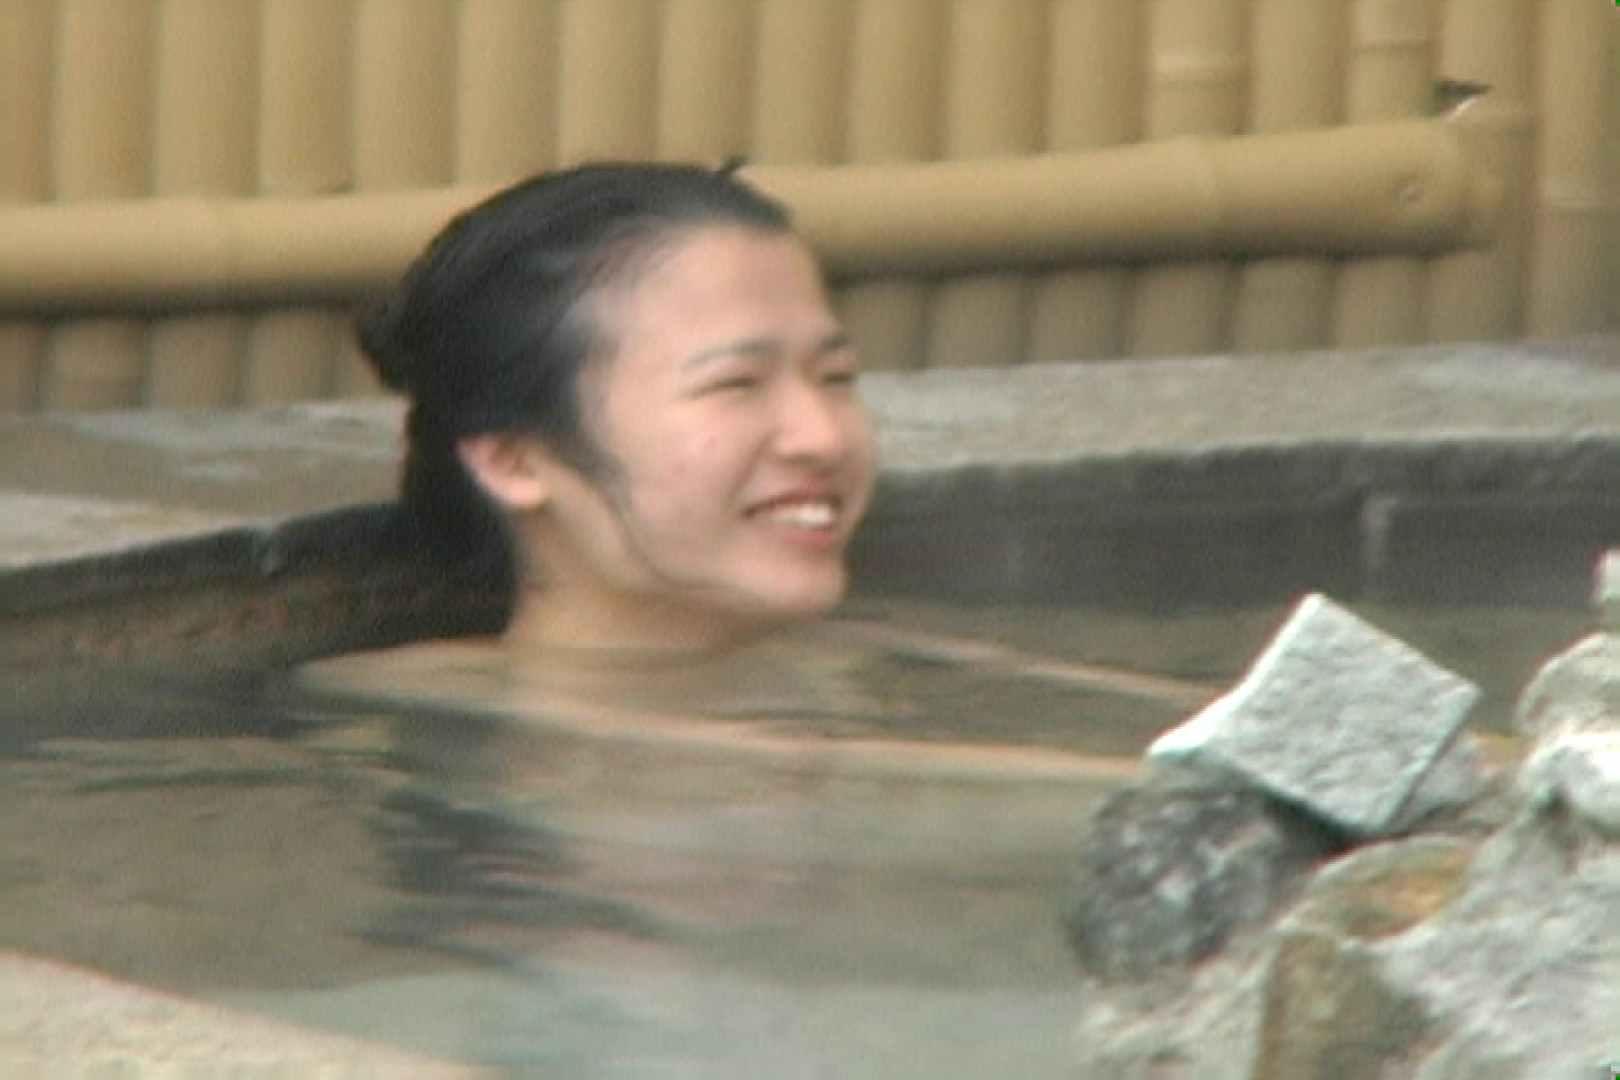 Aquaな露天風呂Vol.647 0   0  58連発 13